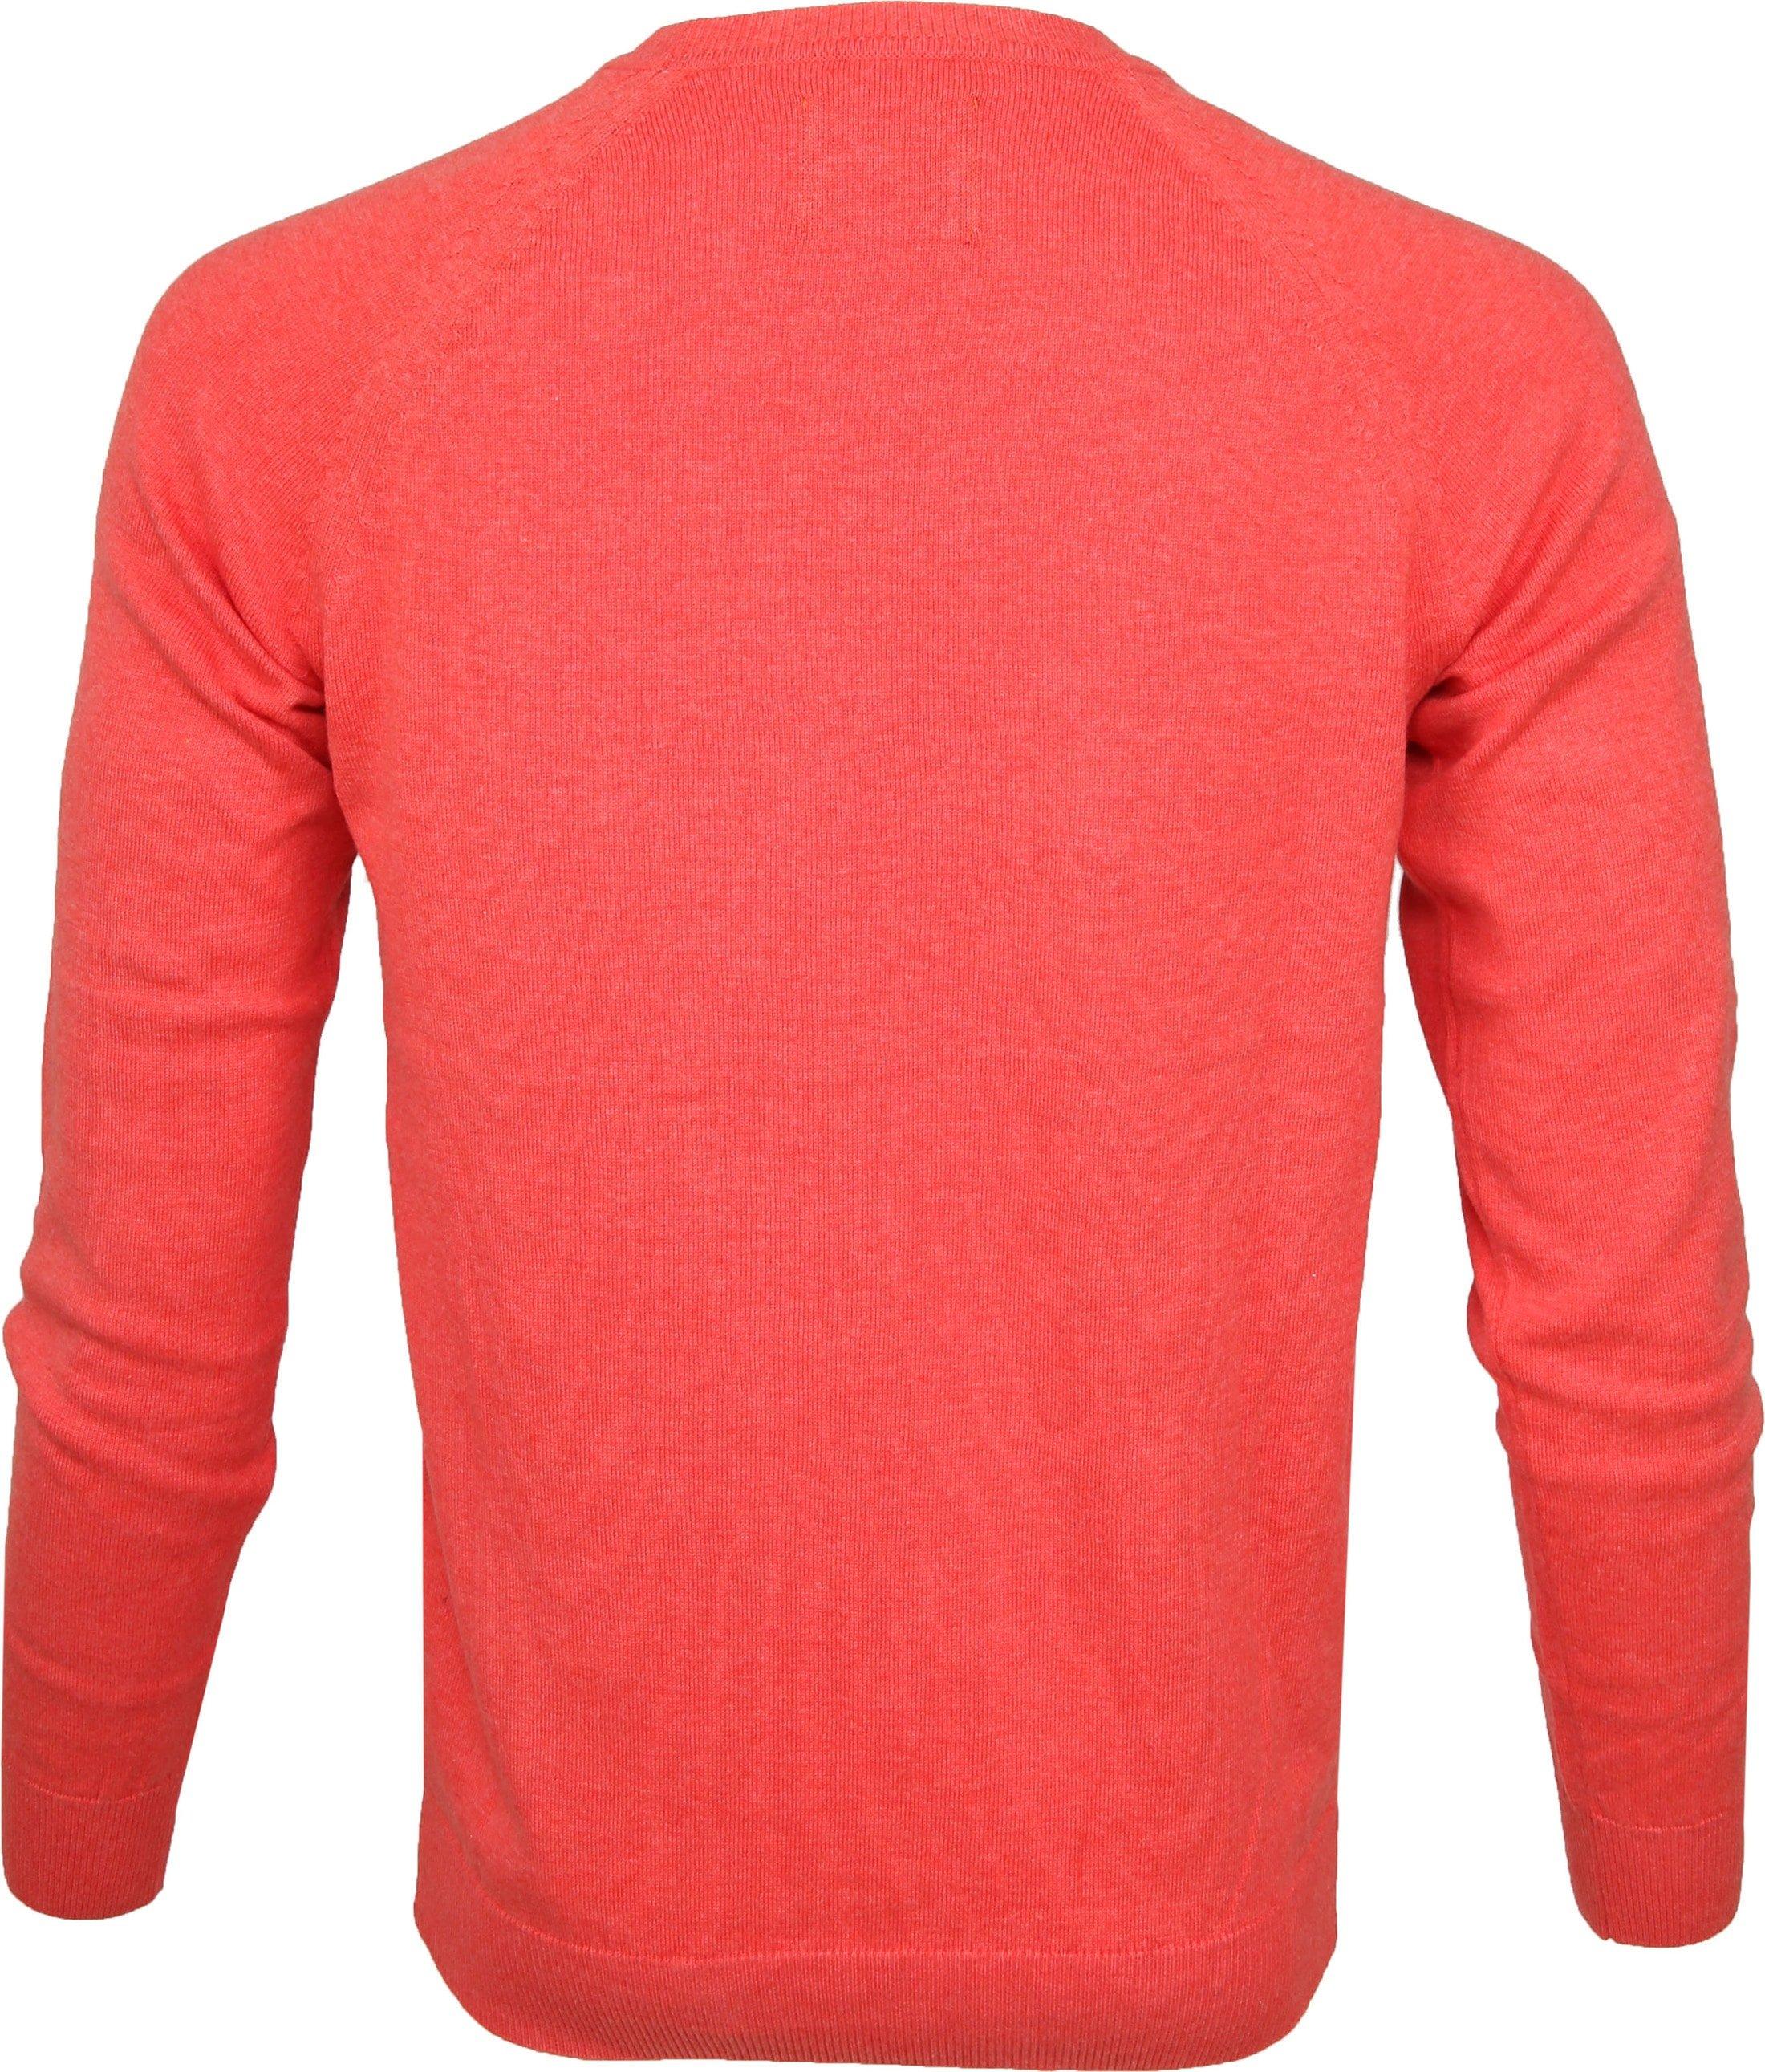 Suitable Pullover Ben Coral foto 2